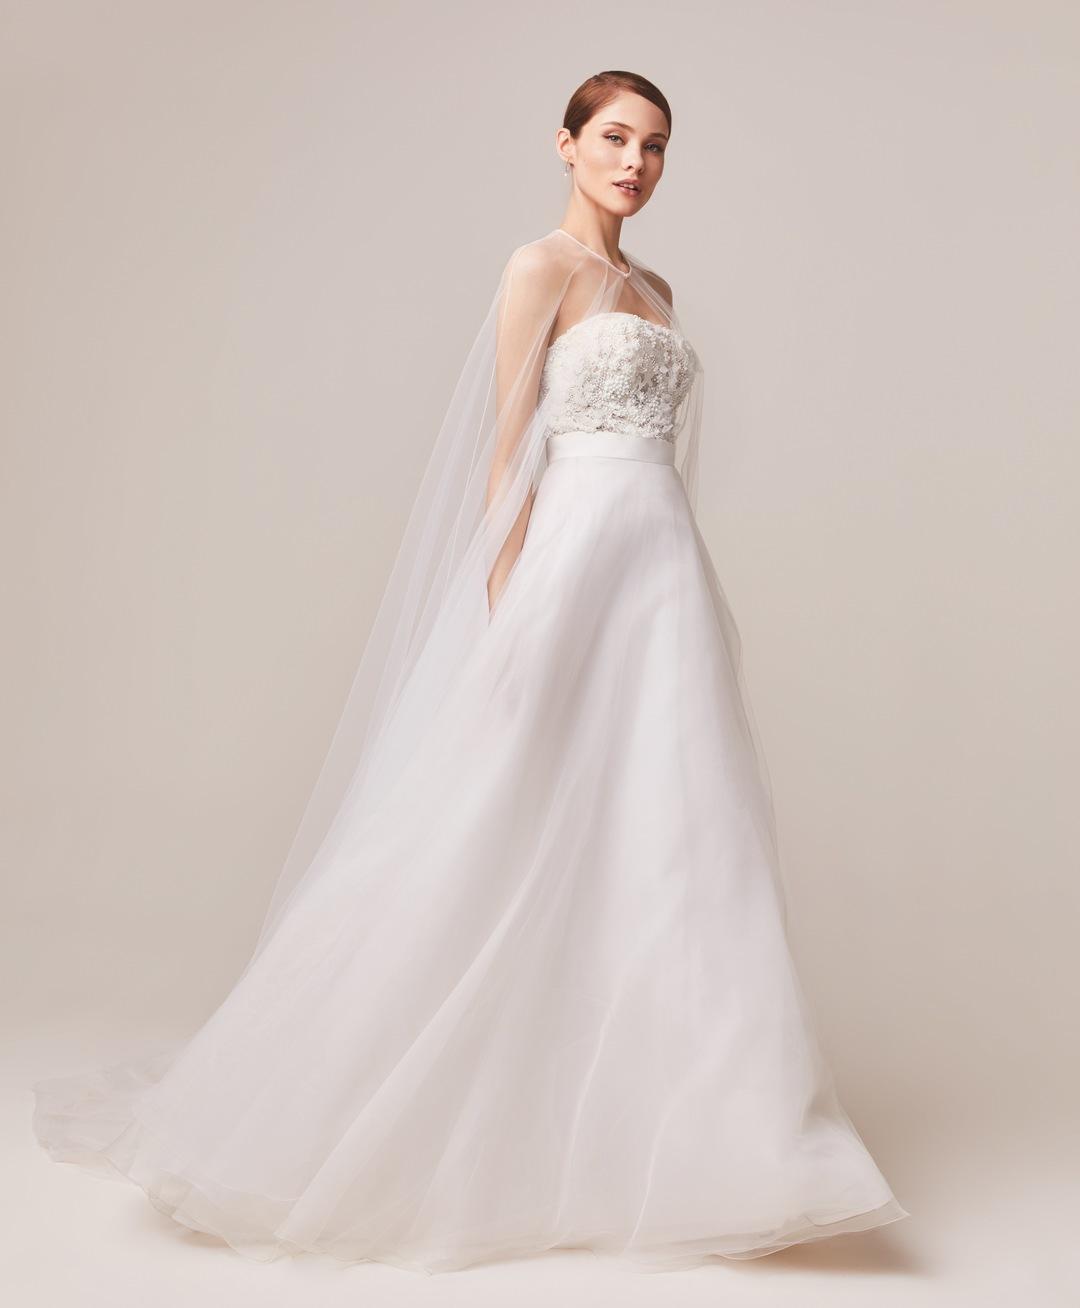 168 dress photo